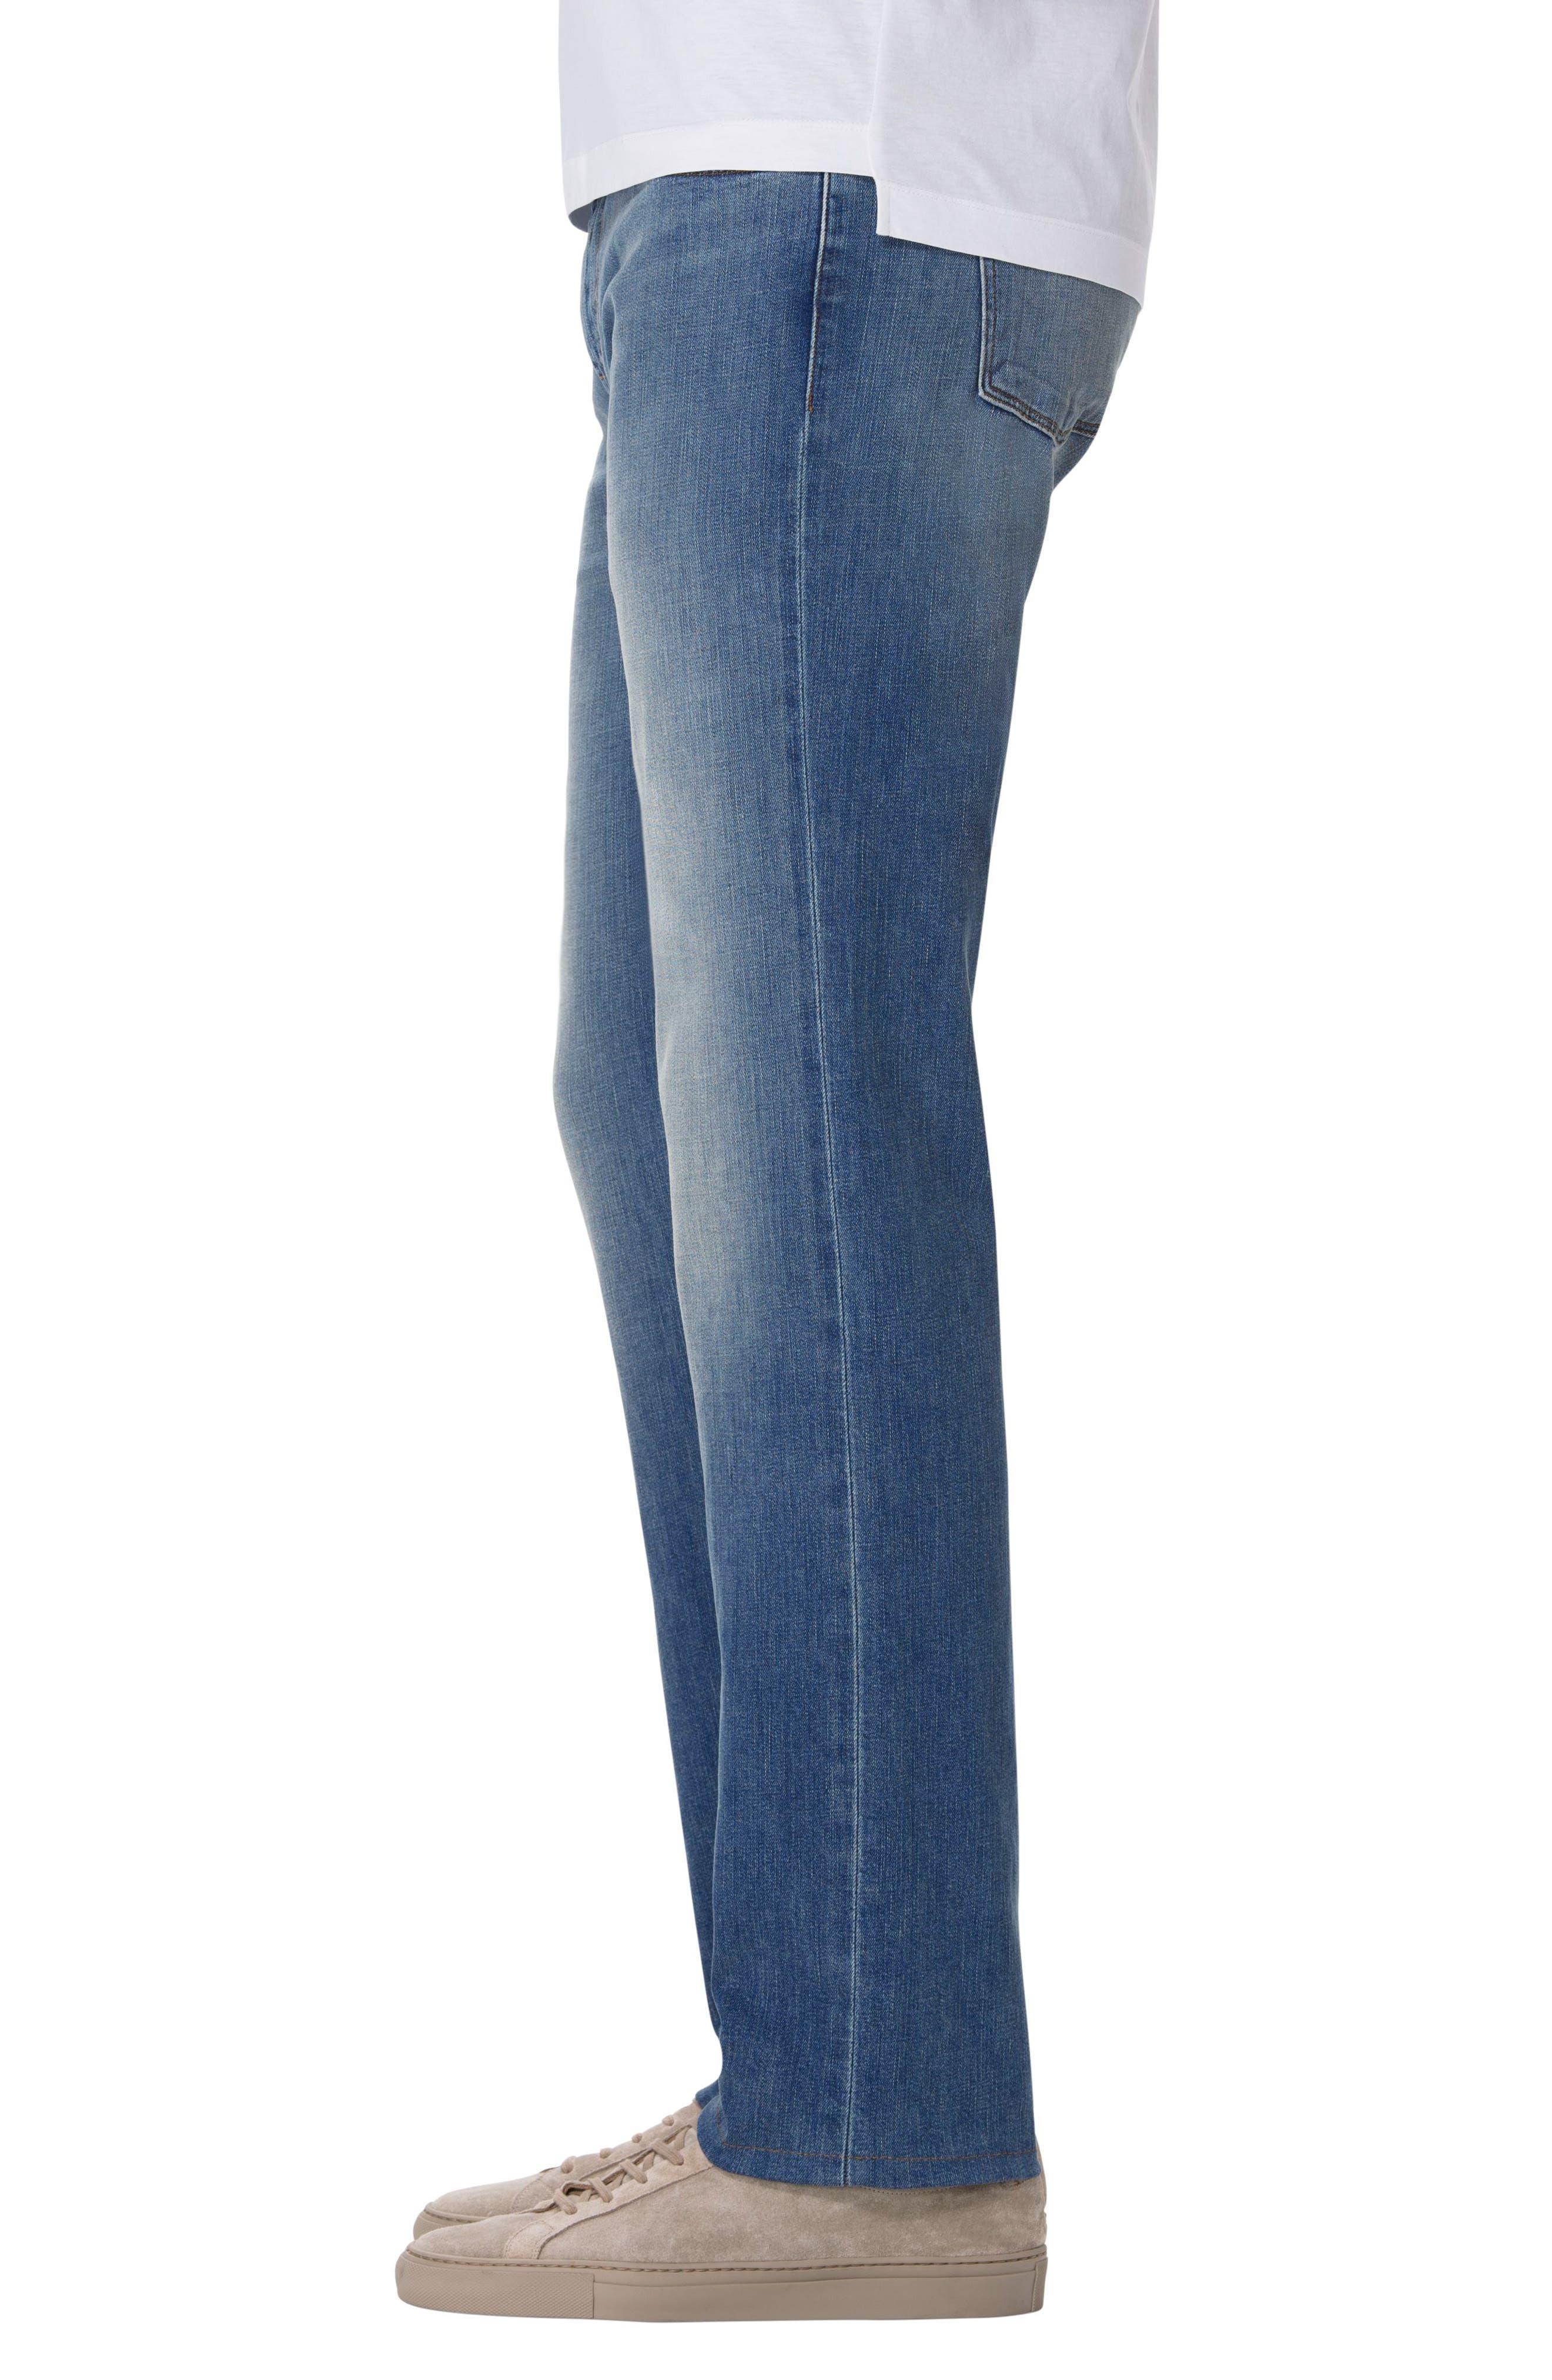 Kane Slim Straight Fit Jeans,                             Alternate thumbnail 3, color,                             452